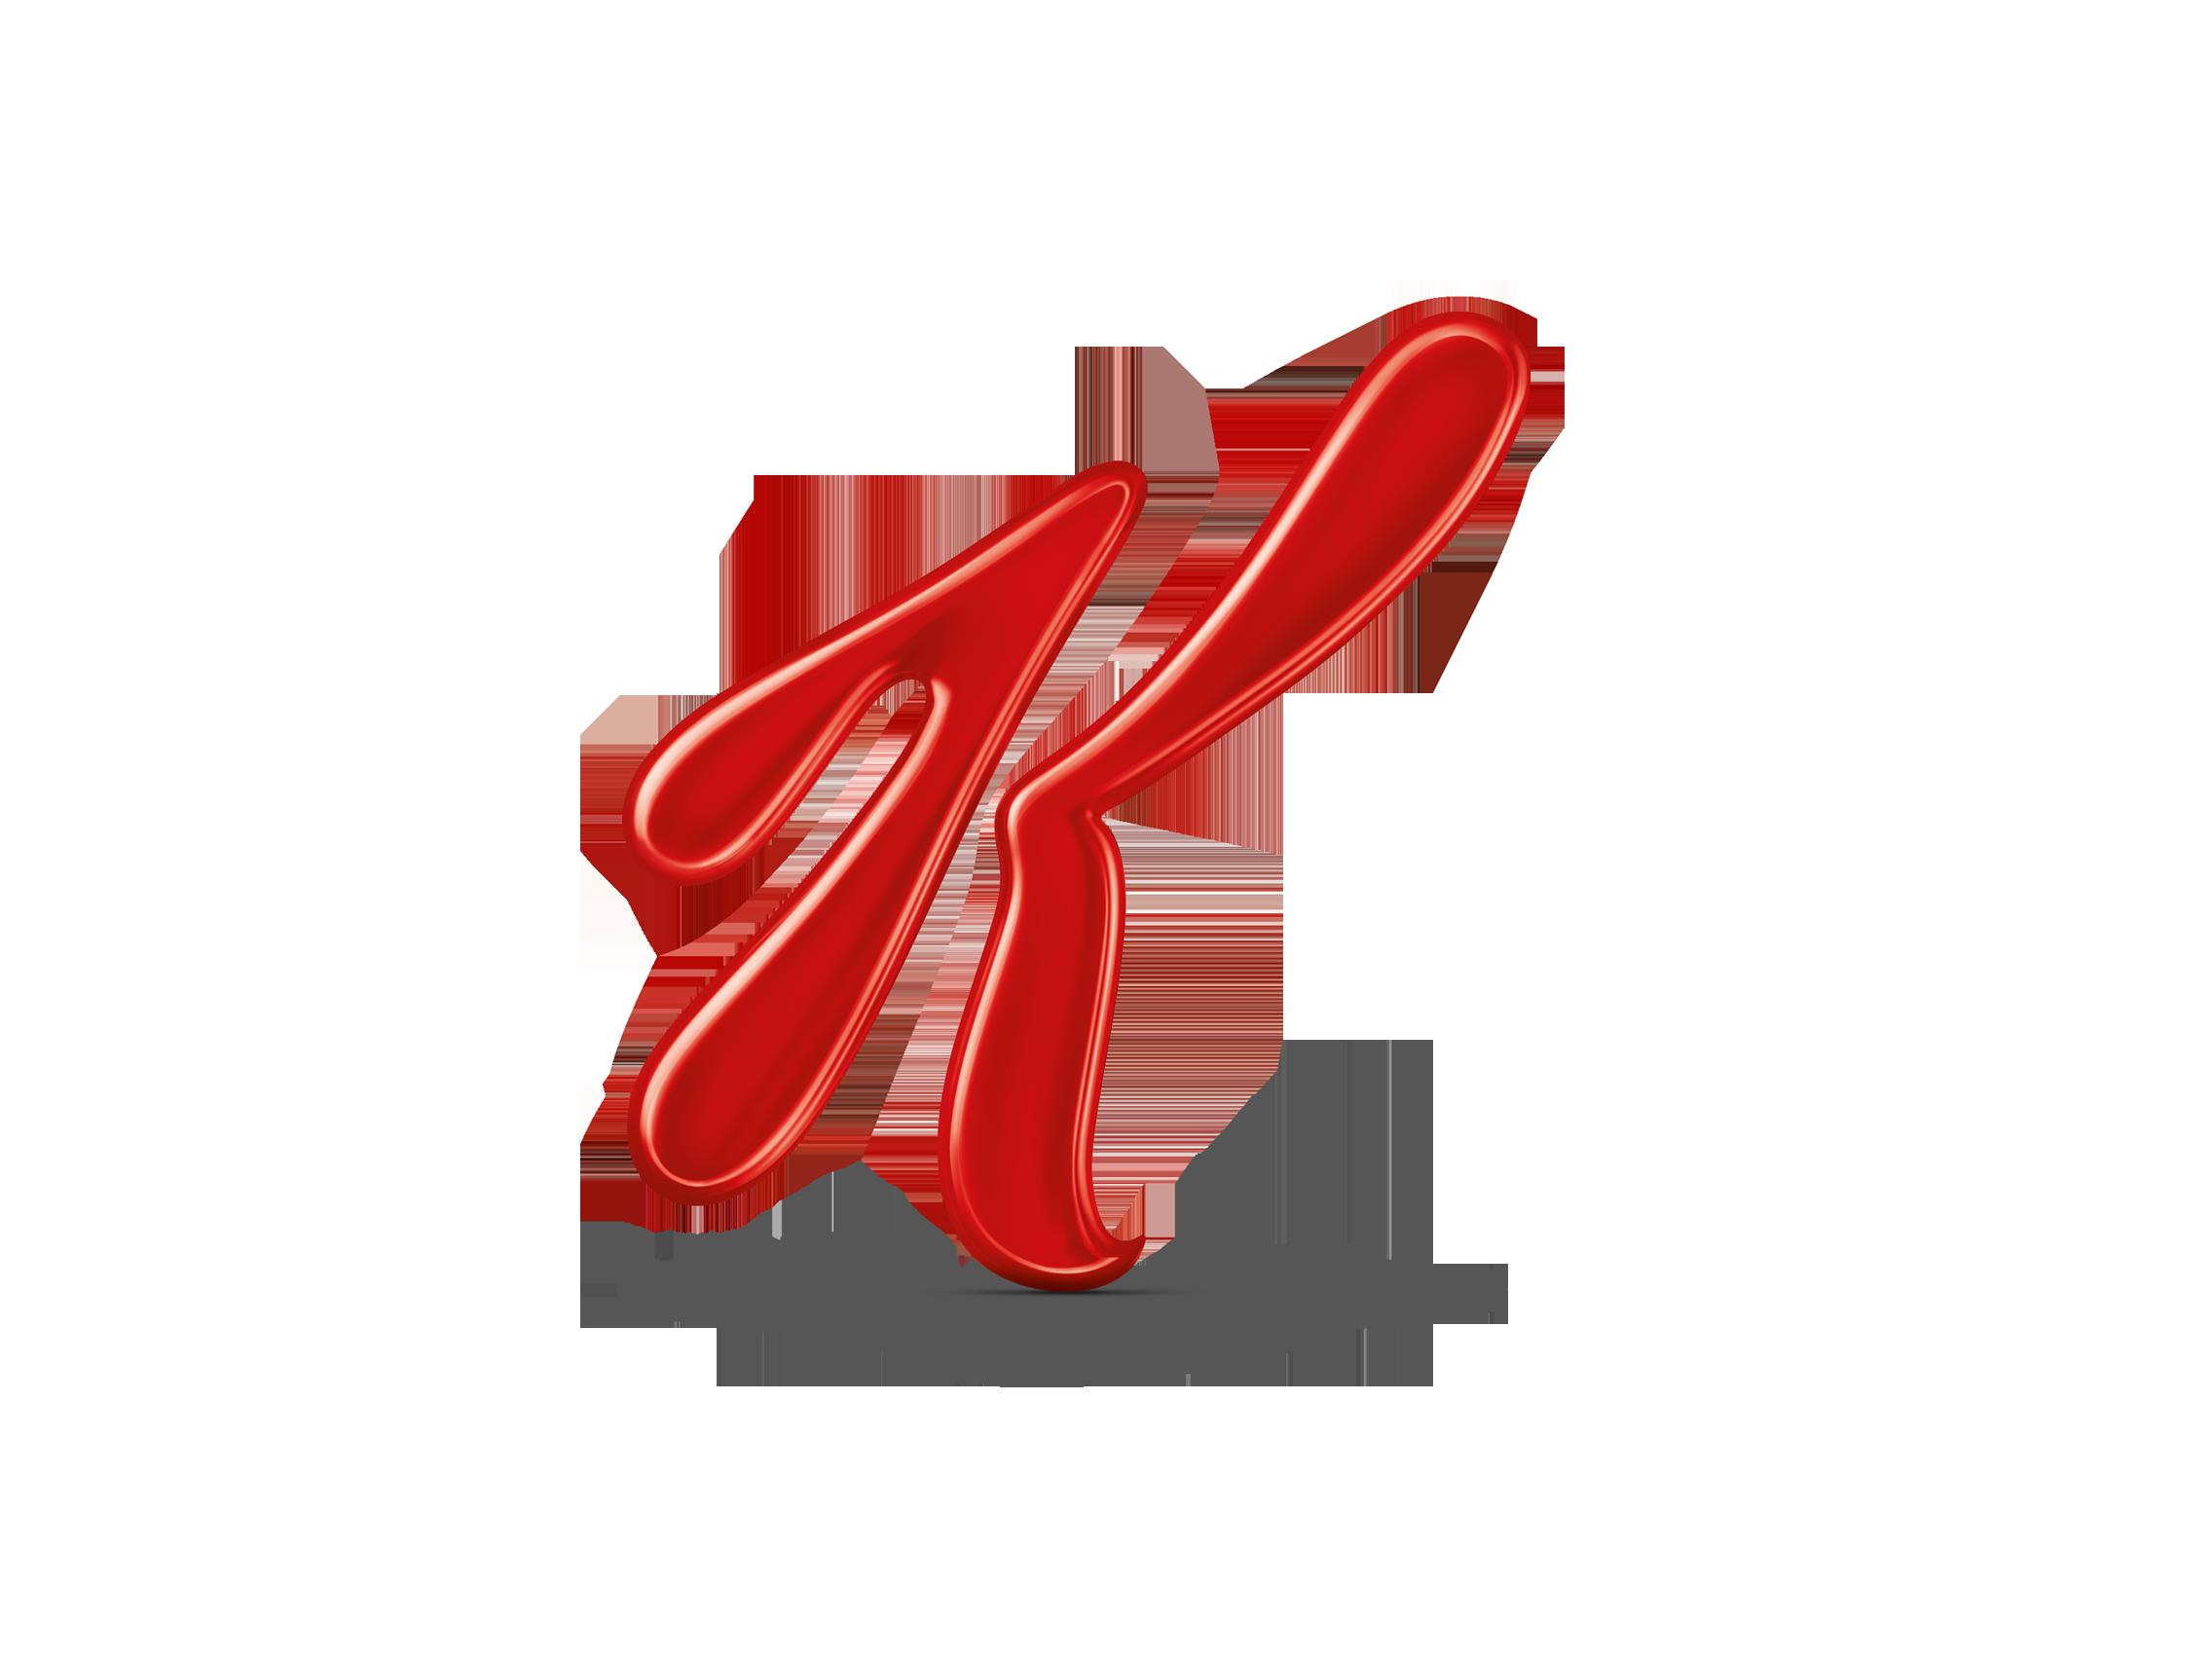 K Logo Wallpaper